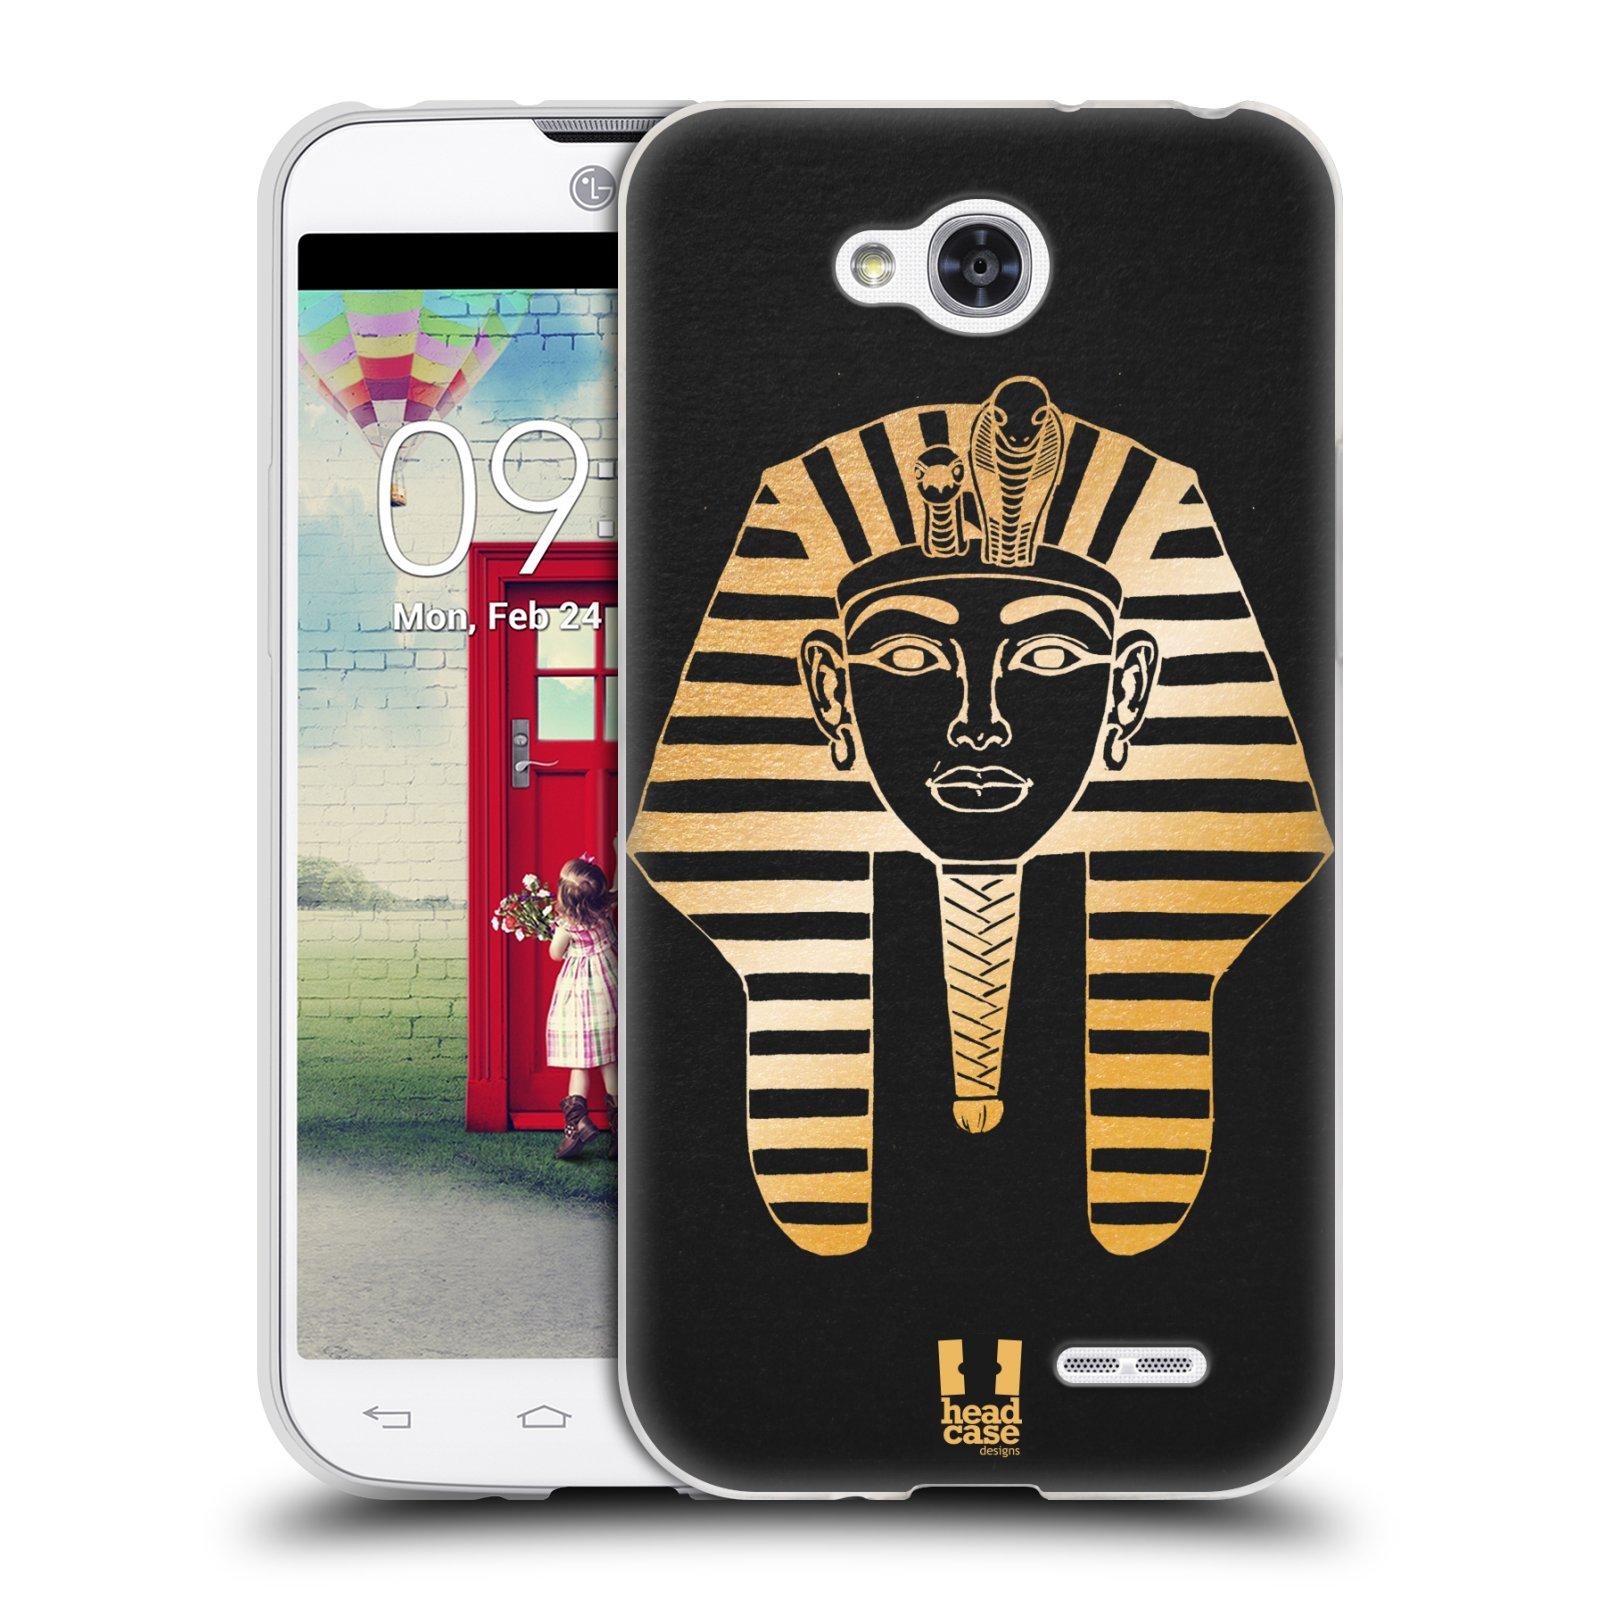 Silikonové pouzdro na mobil LG L90 HEAD CASE EGYPT FARAON (Silikonový kryt či obal na mobilní telefon LG L90 D405n)